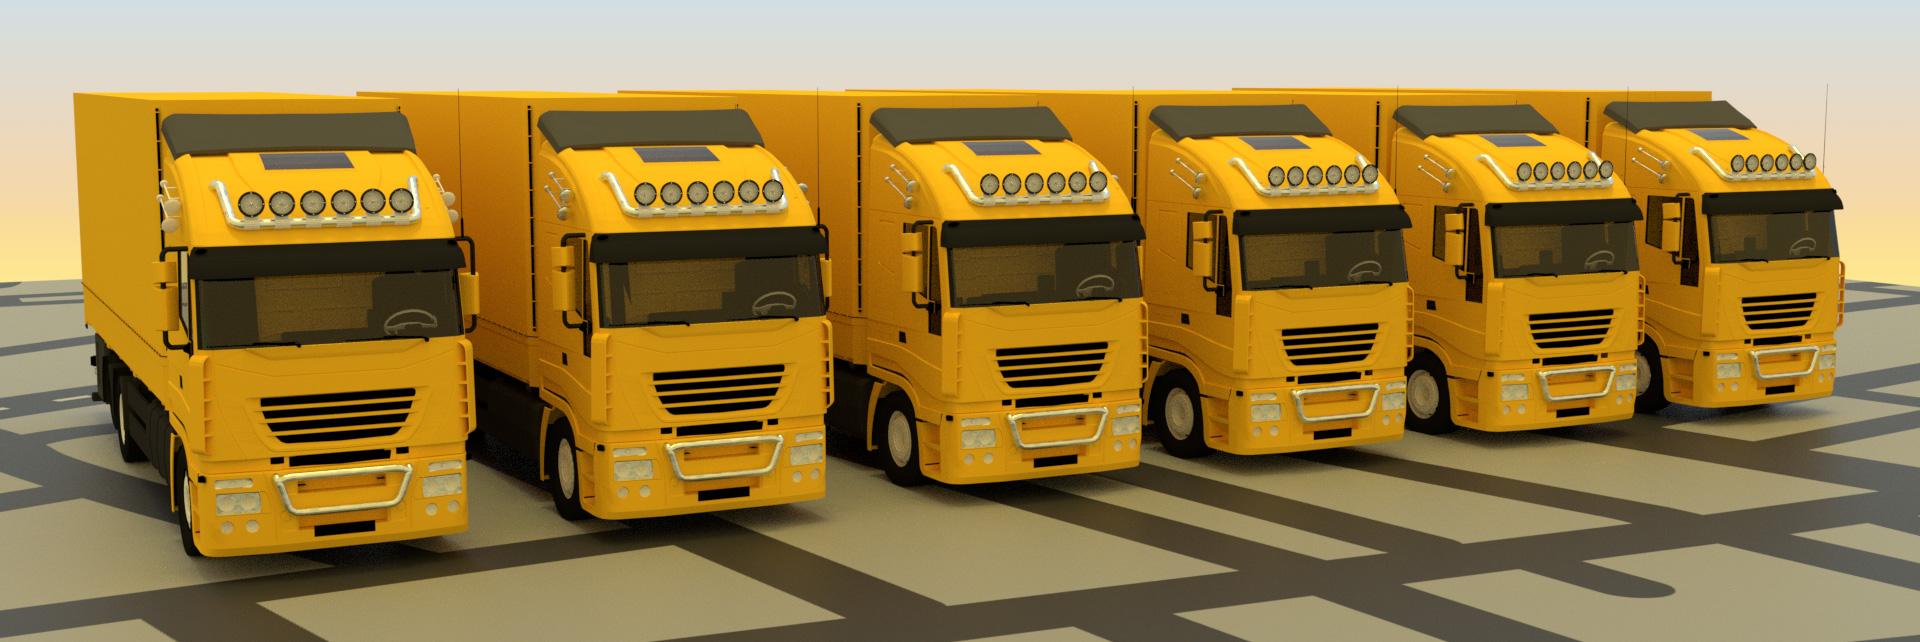 render-trucks-inlinea-slide-home